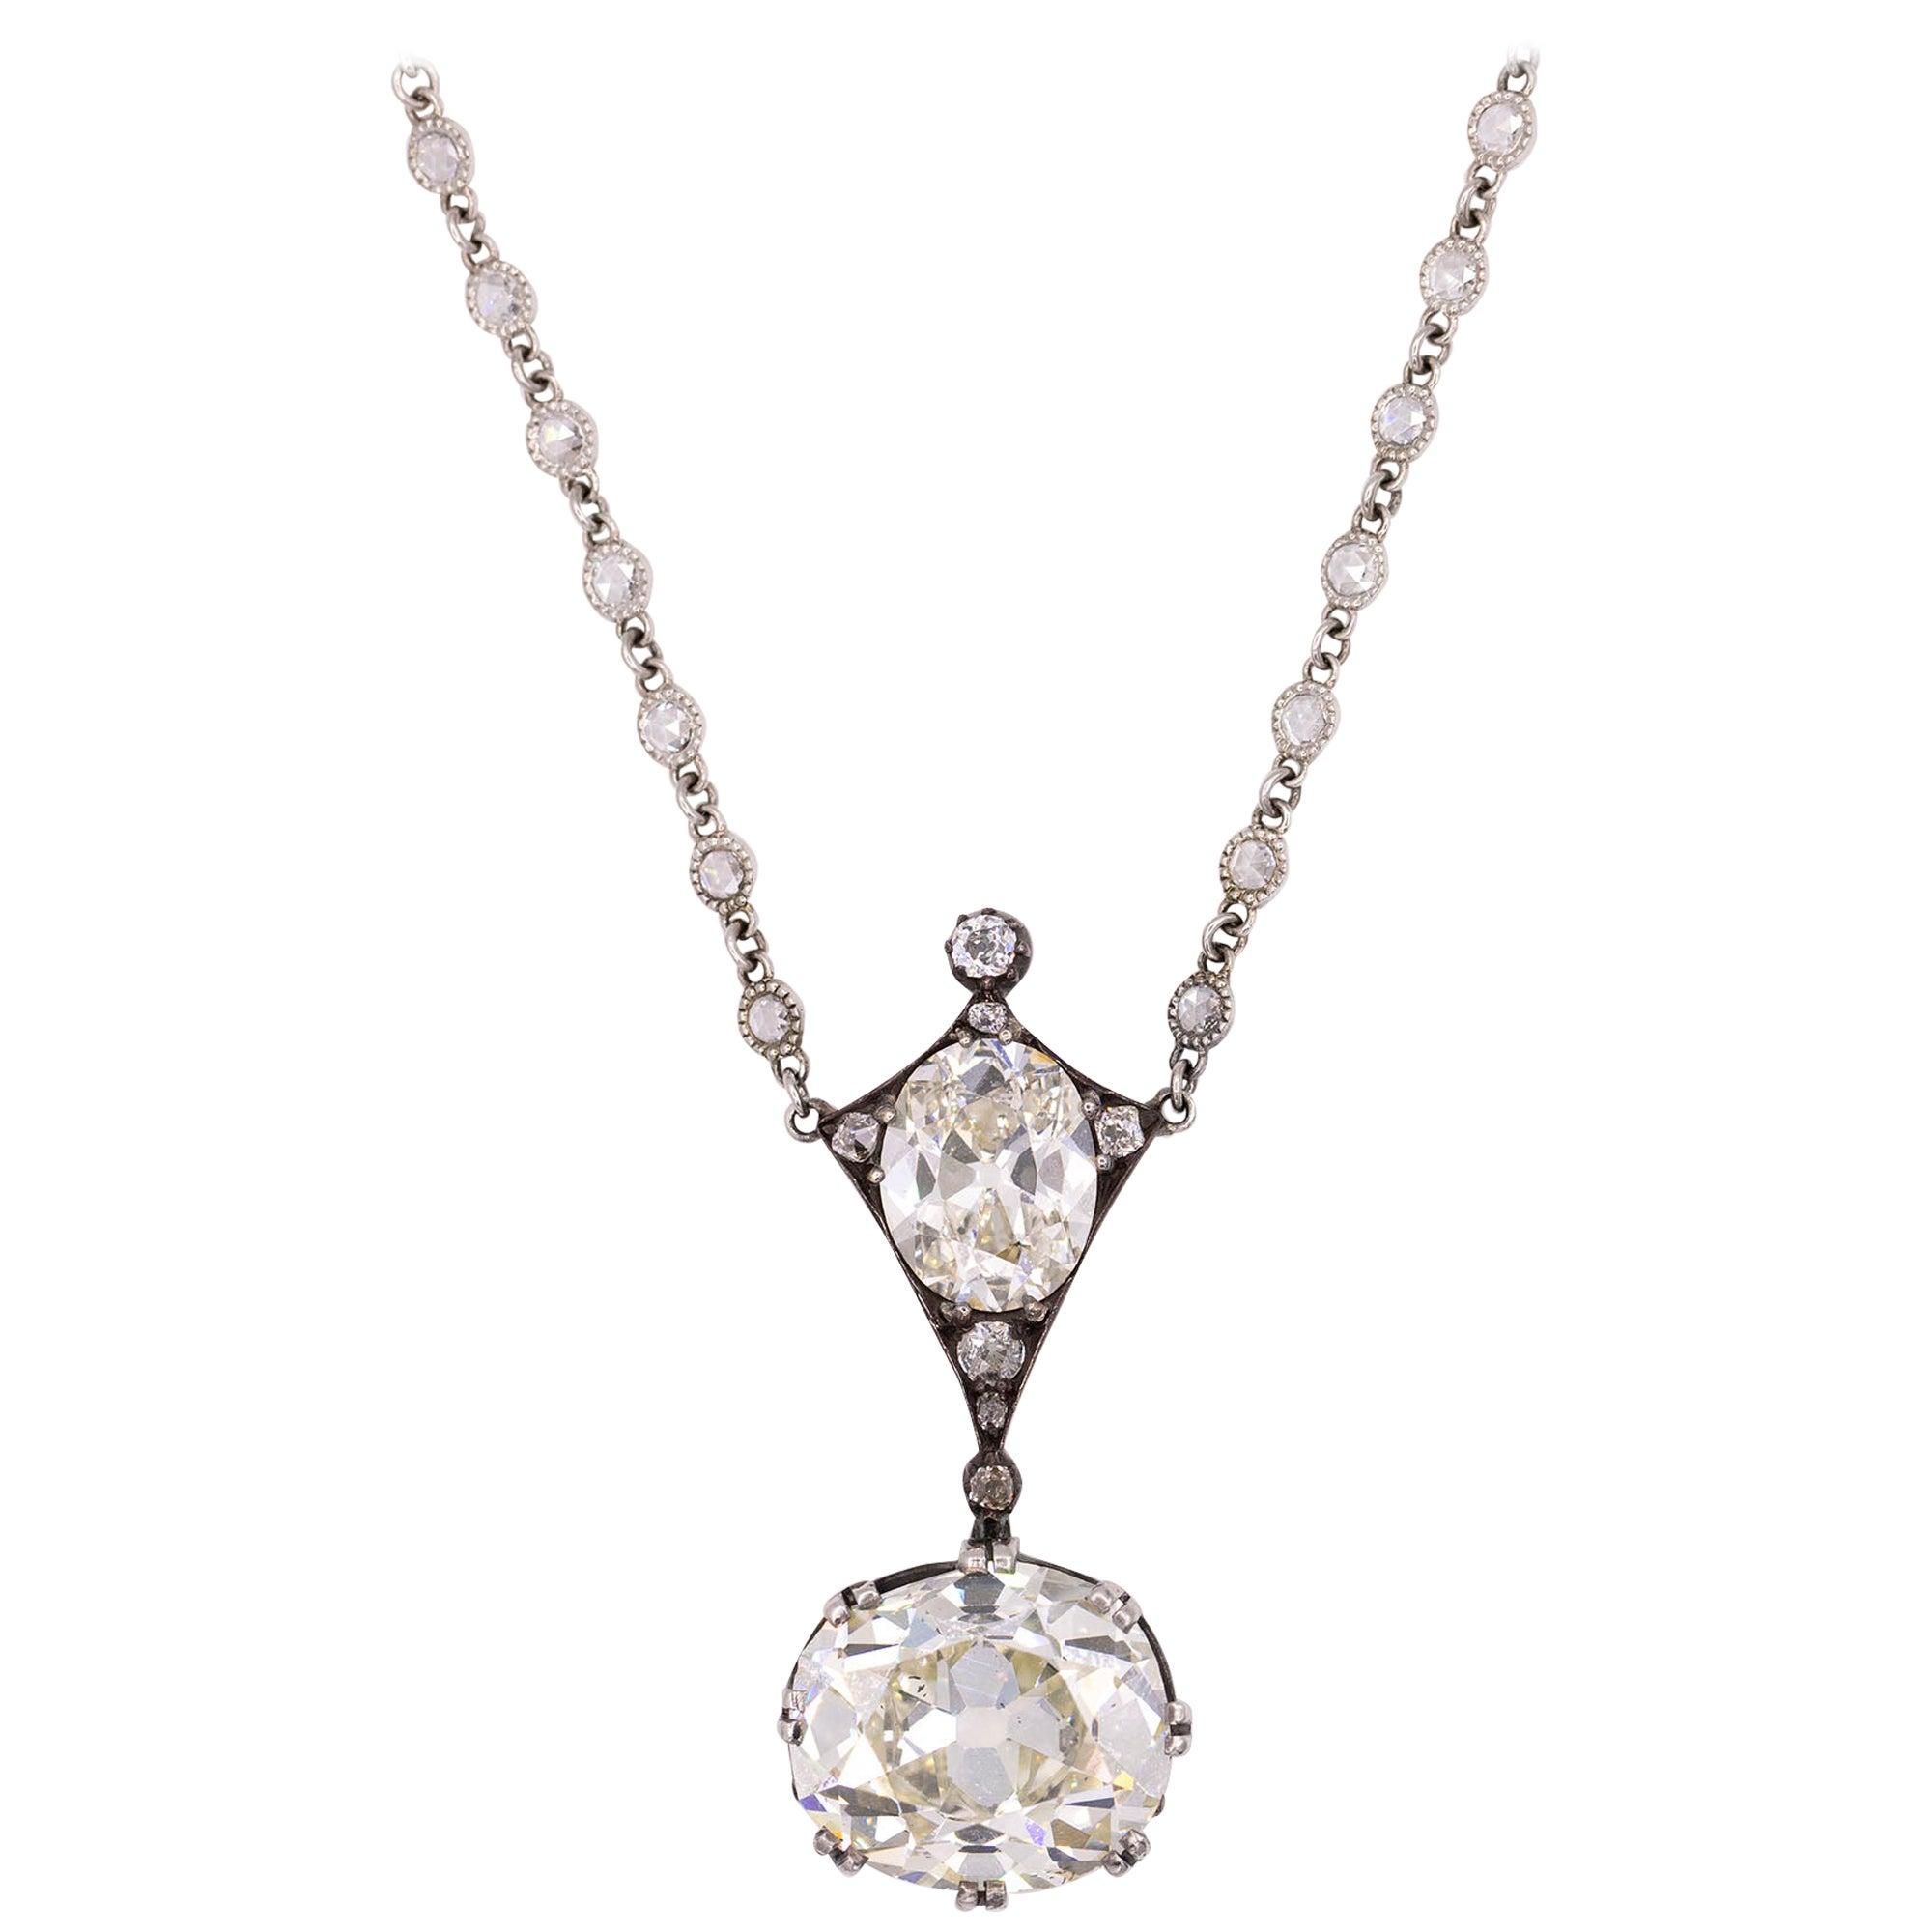 Antique Platinum and Sterling Silver Diamond Pendant